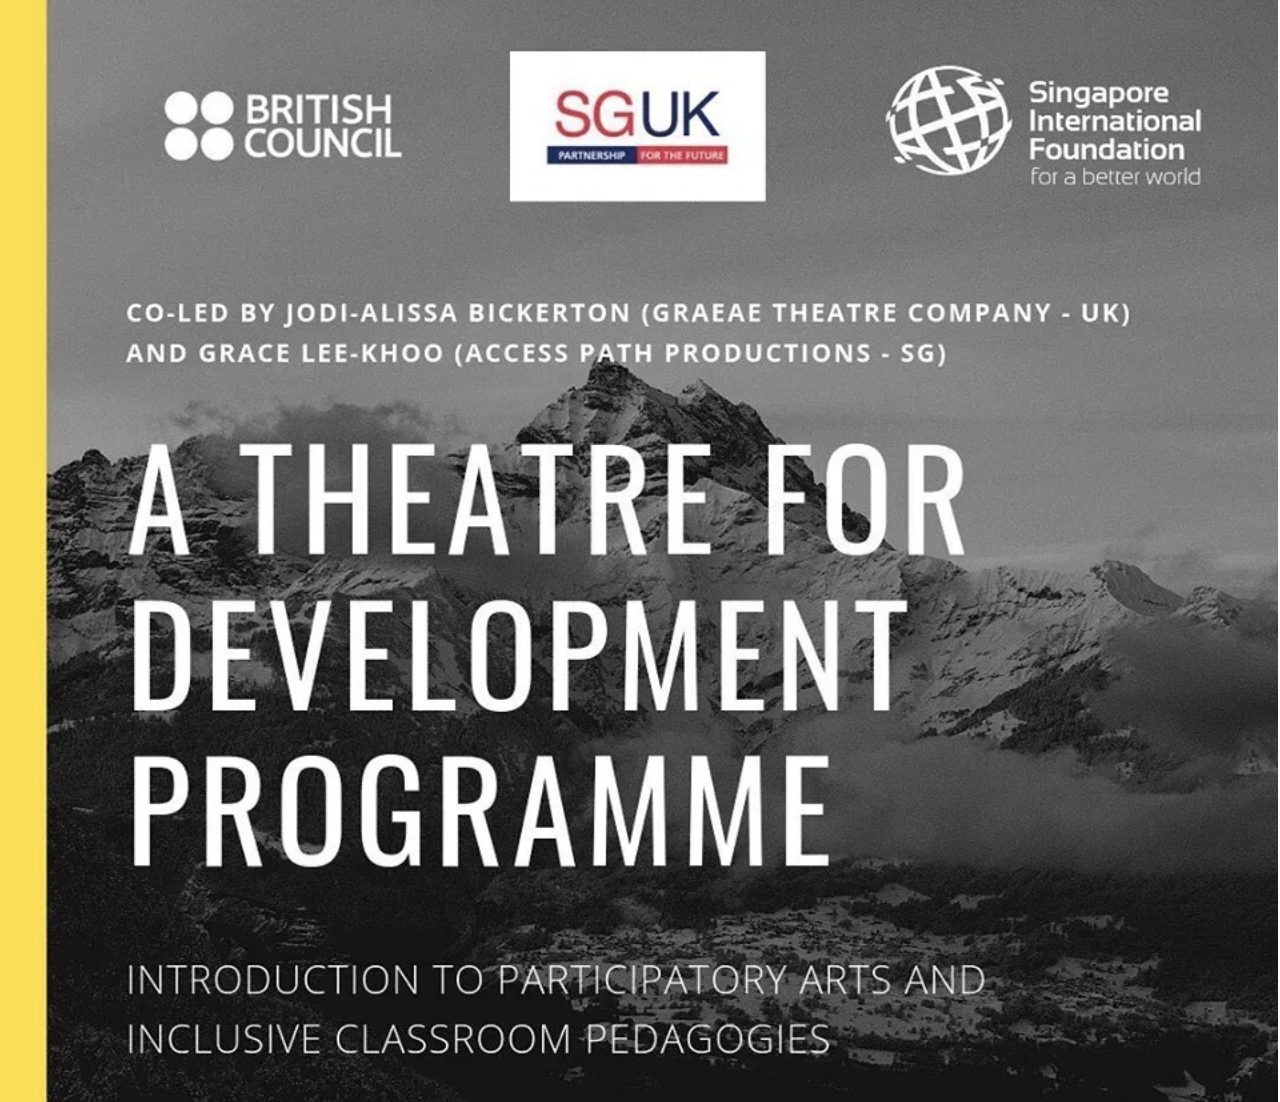 theatre-for-development-_0_72836900_1569160976 Events